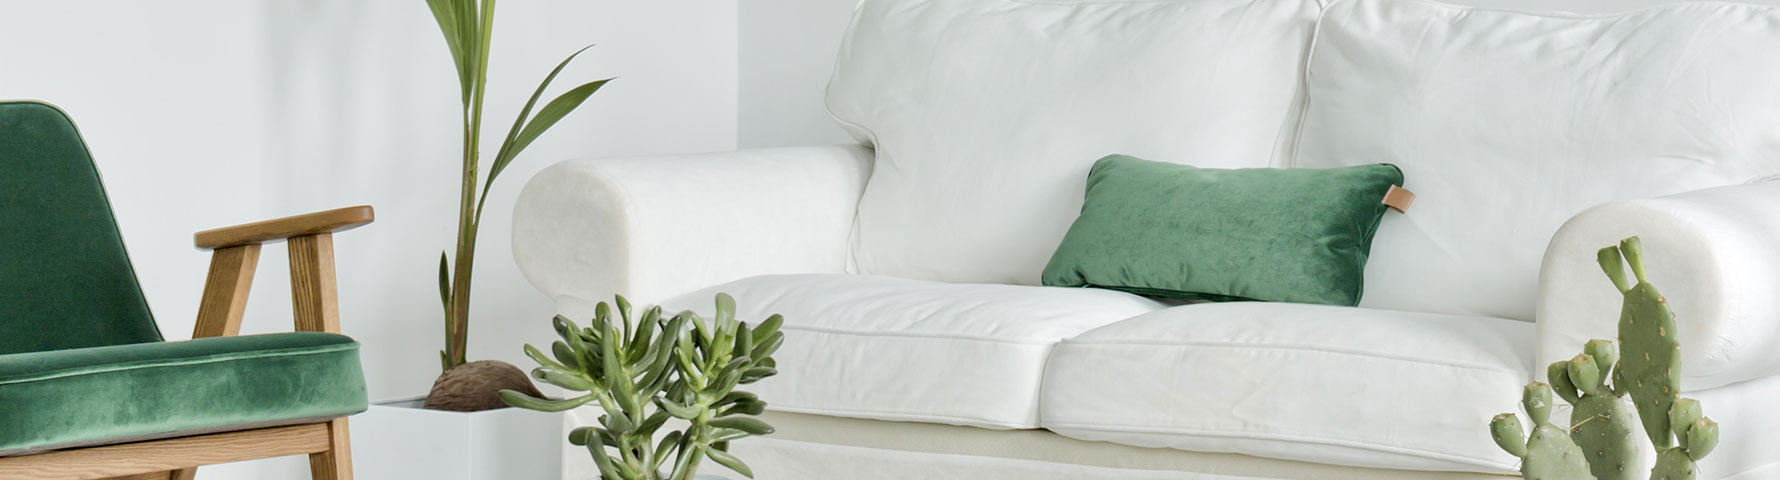 scandinavian sofa style